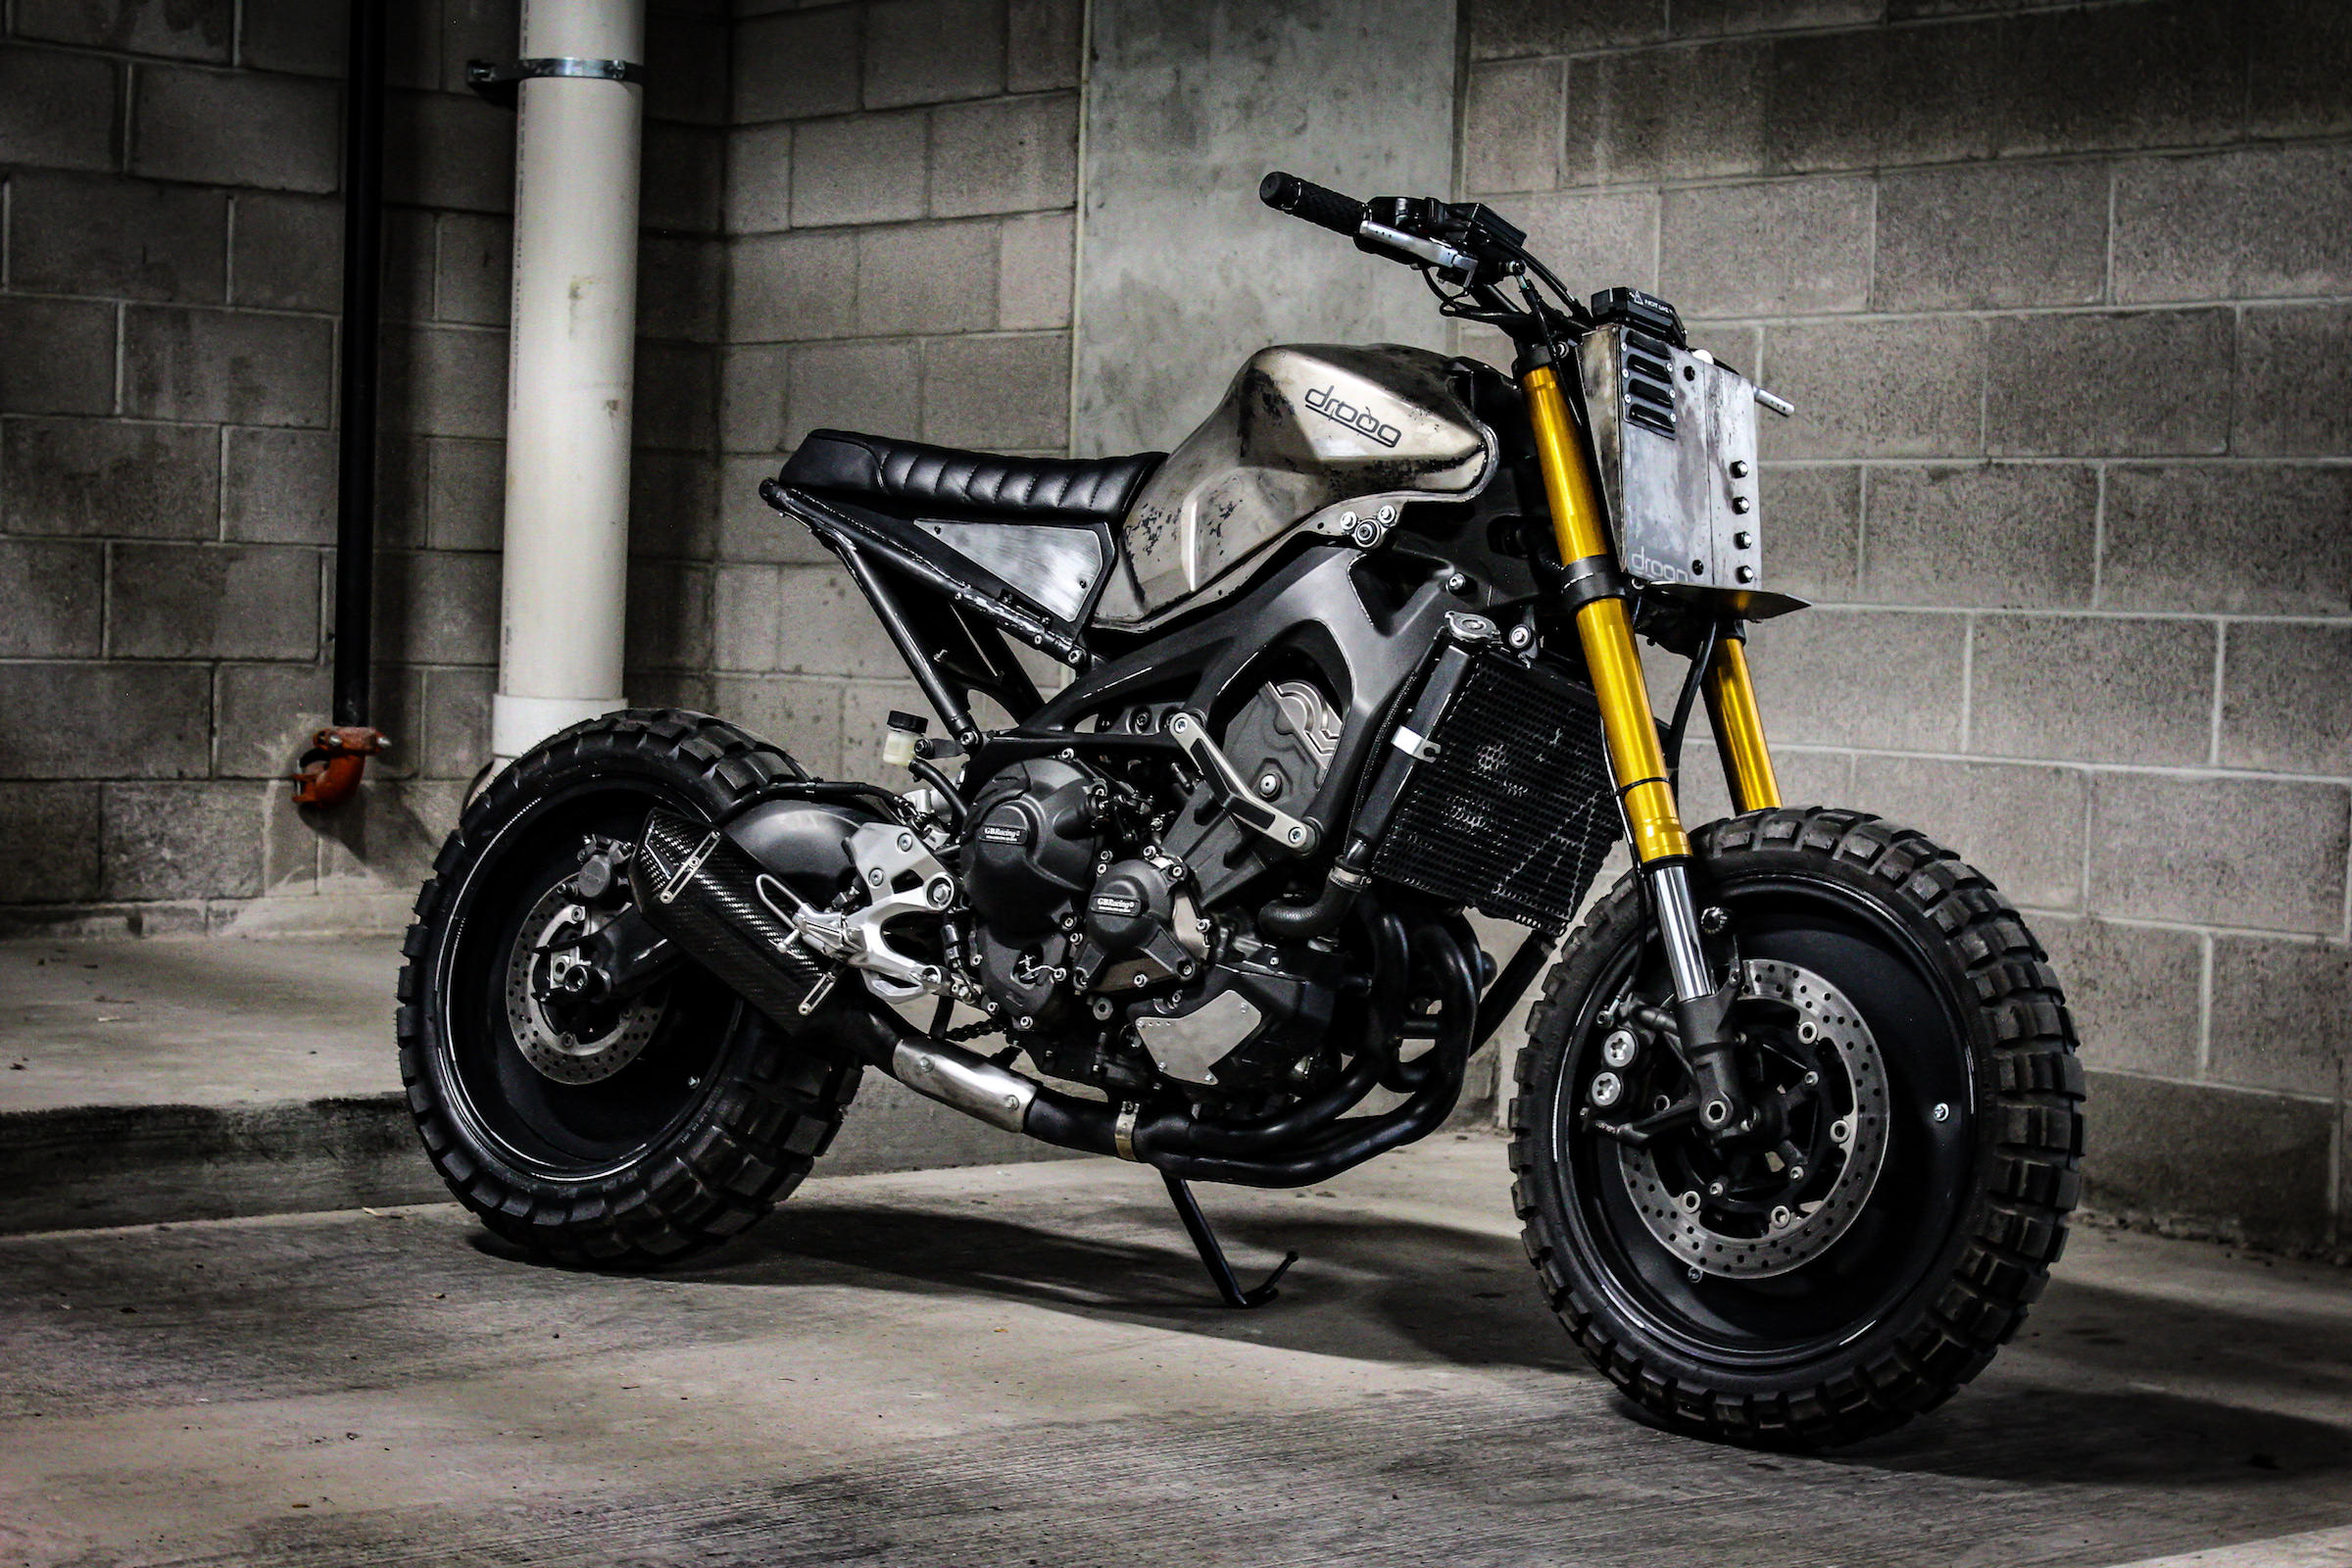 droog moto custom yamaha fz 09 the moto 3. Black Bedroom Furniture Sets. Home Design Ideas